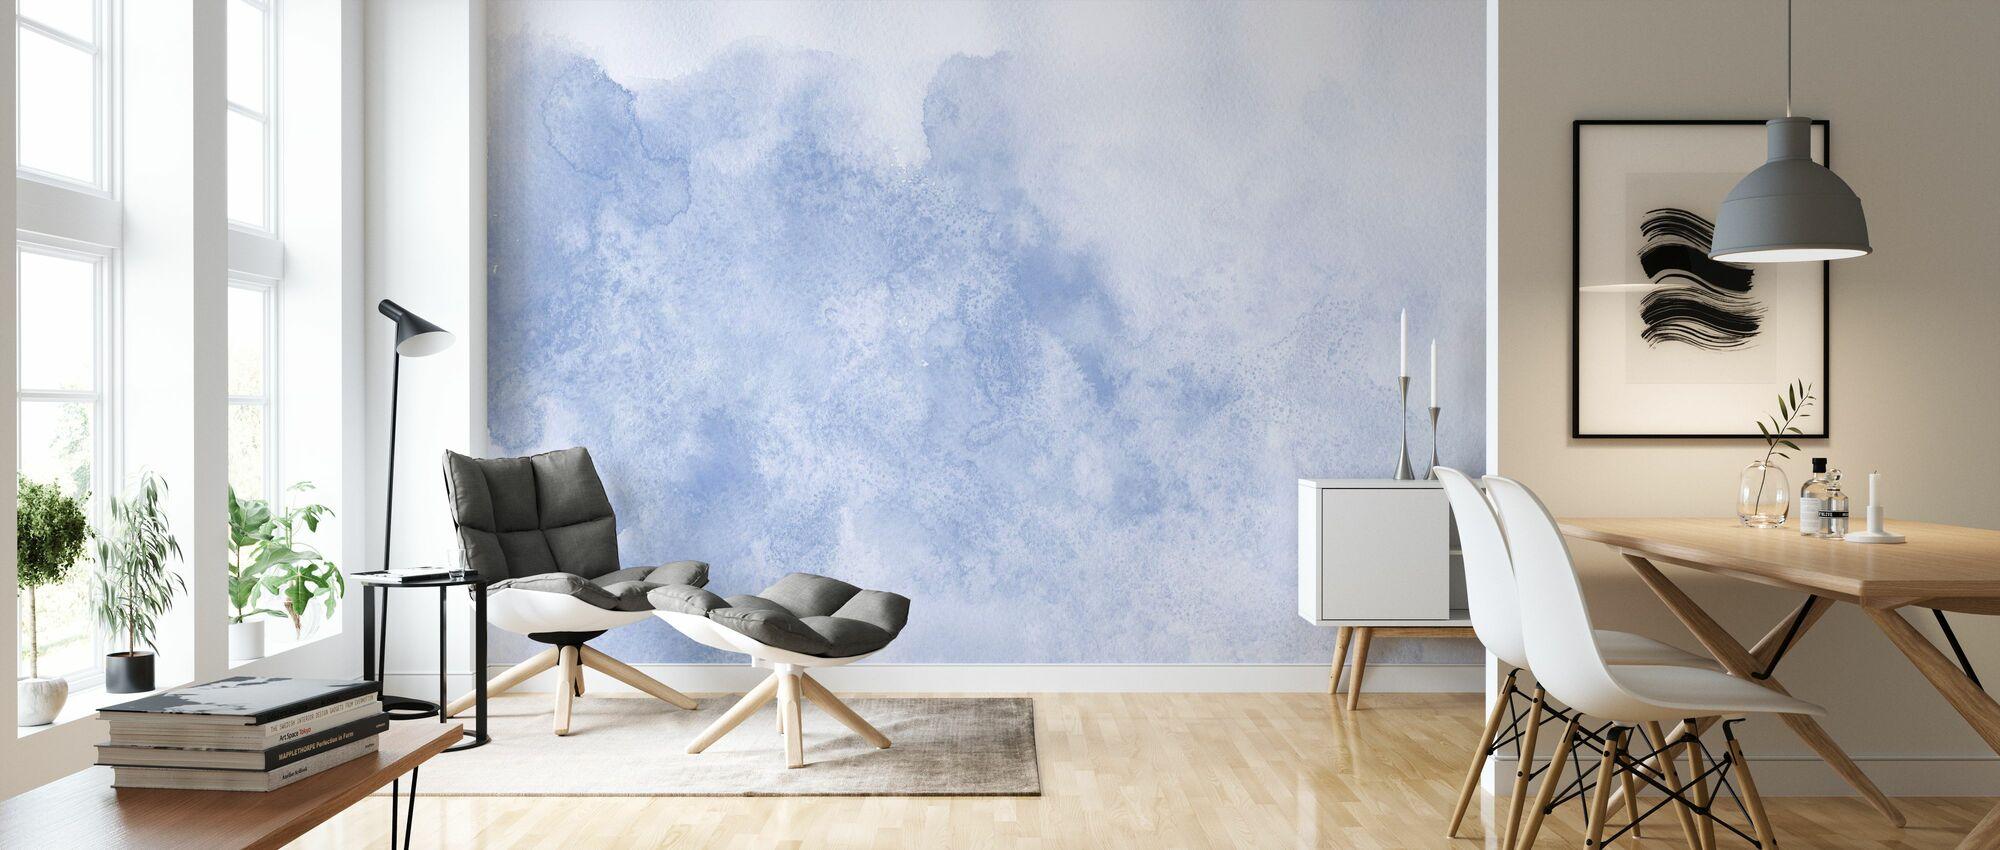 Watercolor Minimalism XII - Wallpaper - Living Room